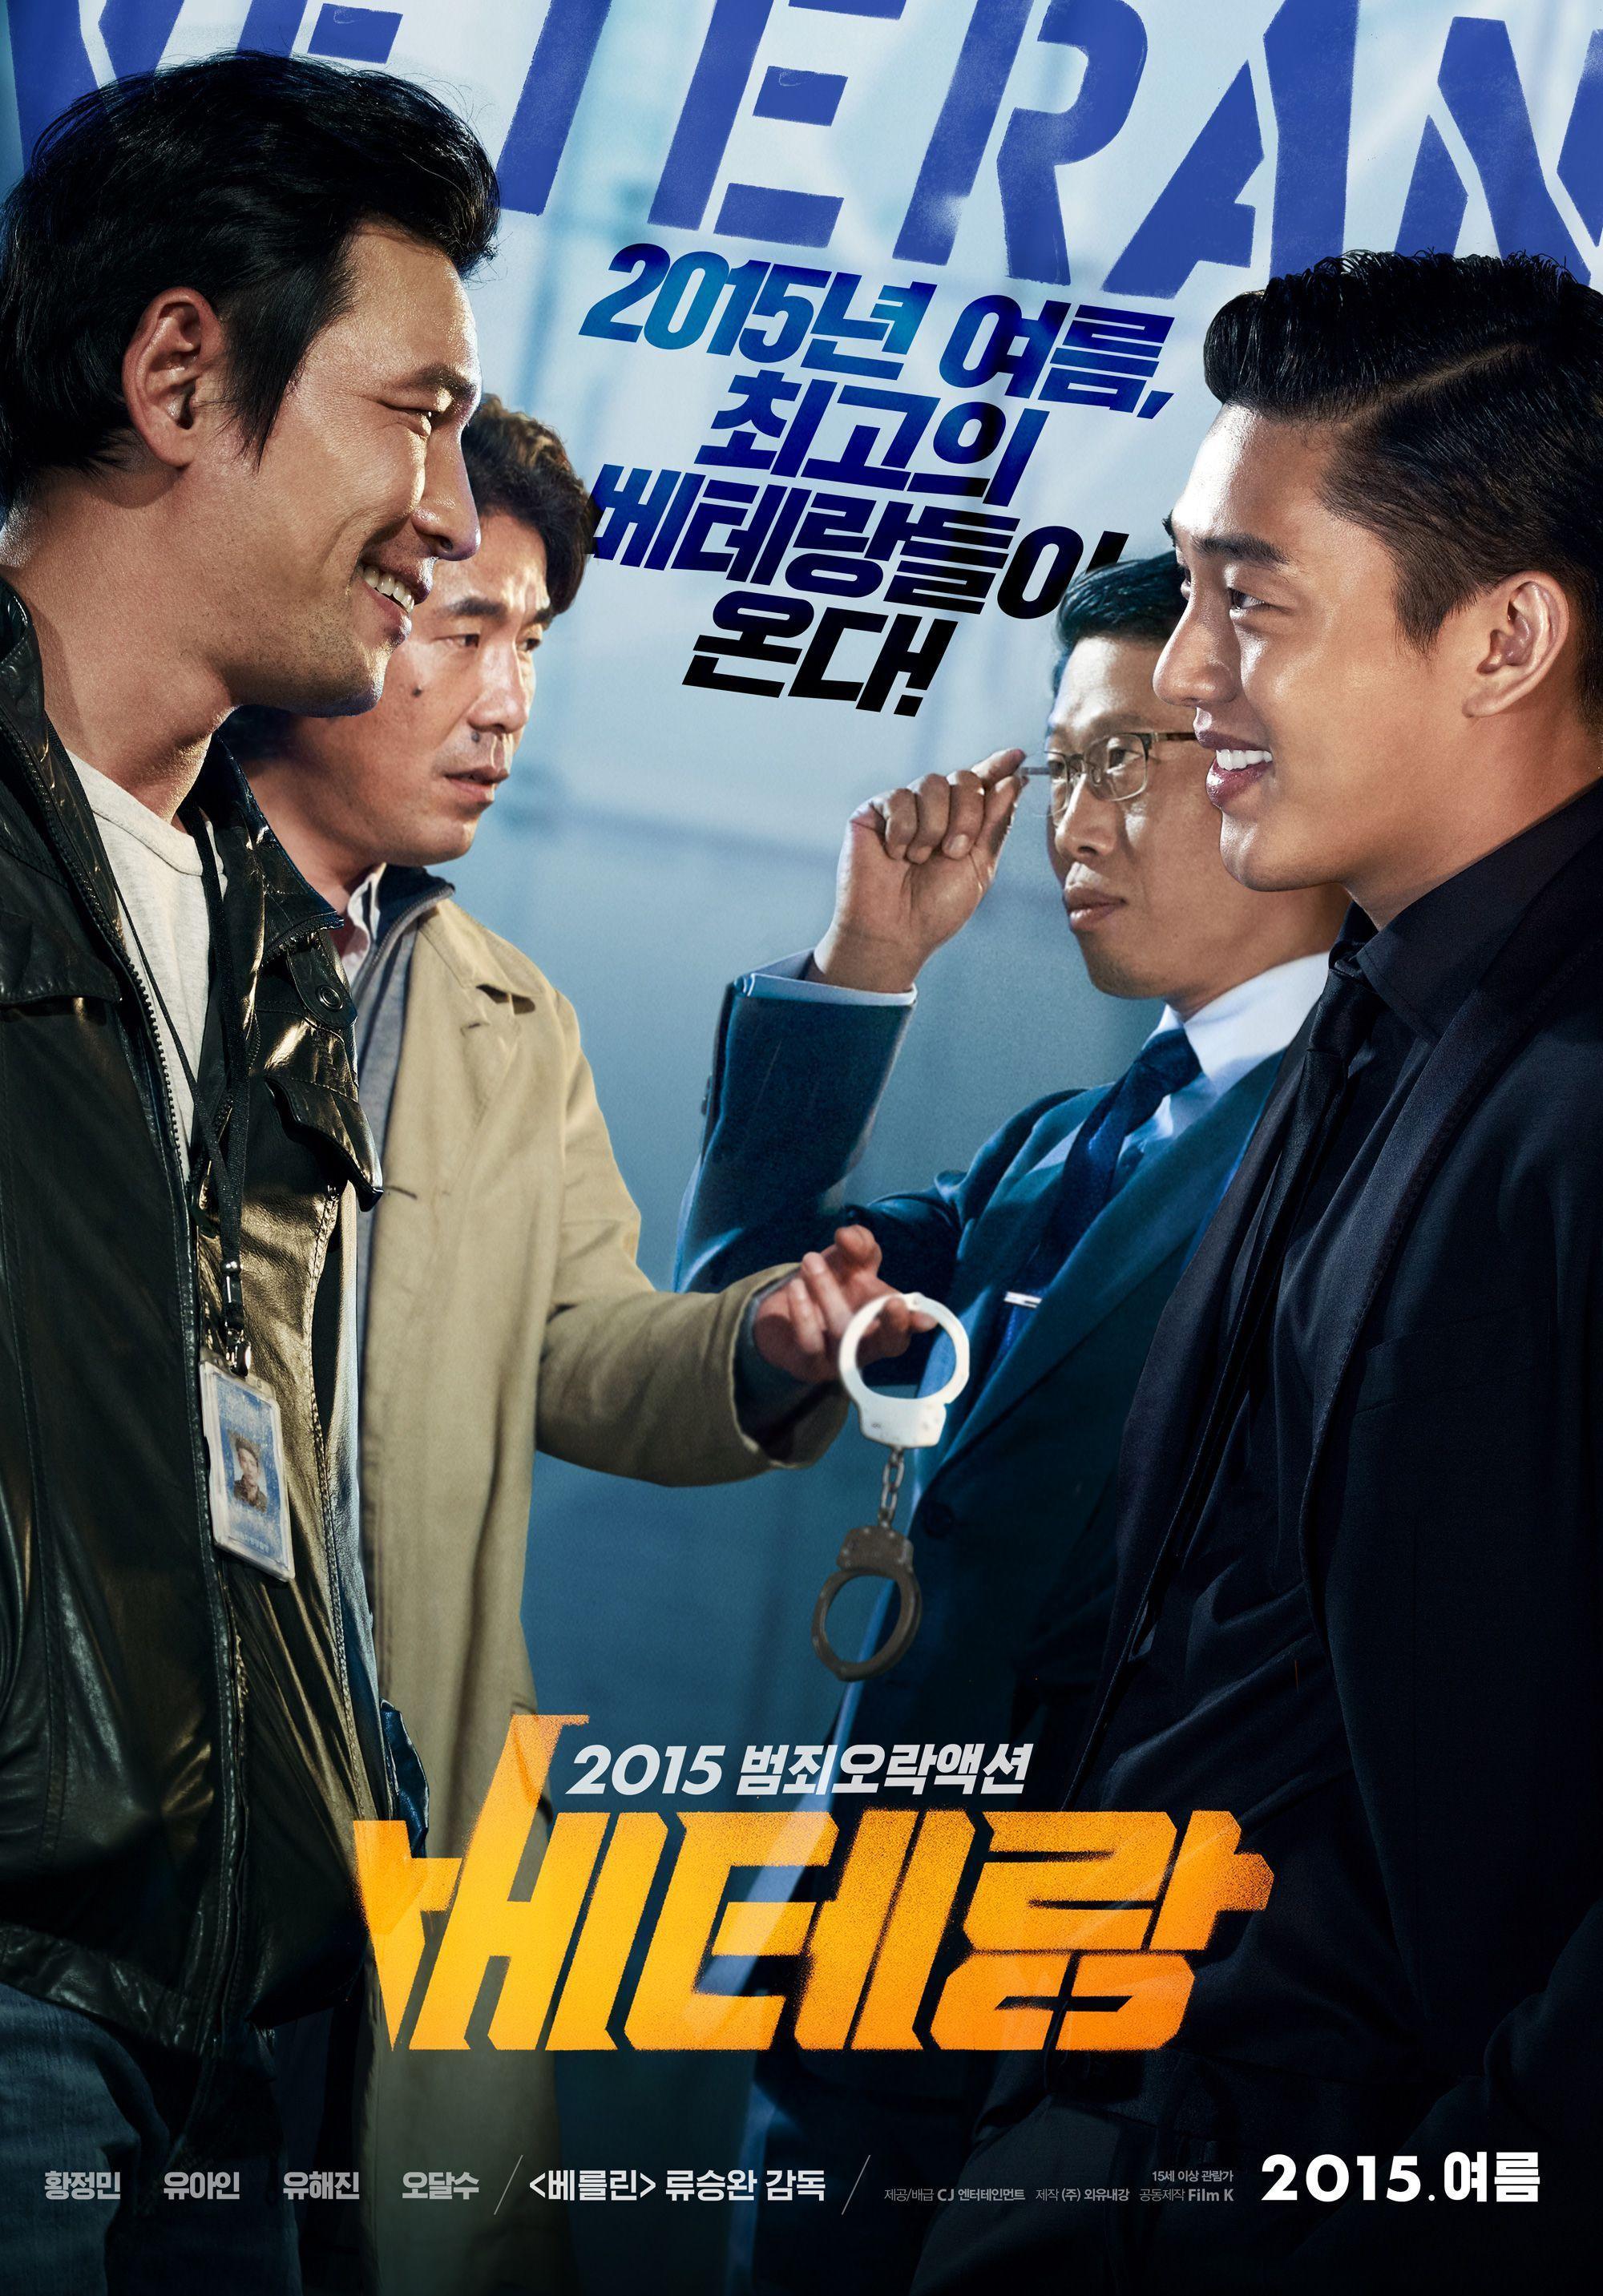 Main Film Remake Korea, Salman Khan Jadi Detektif